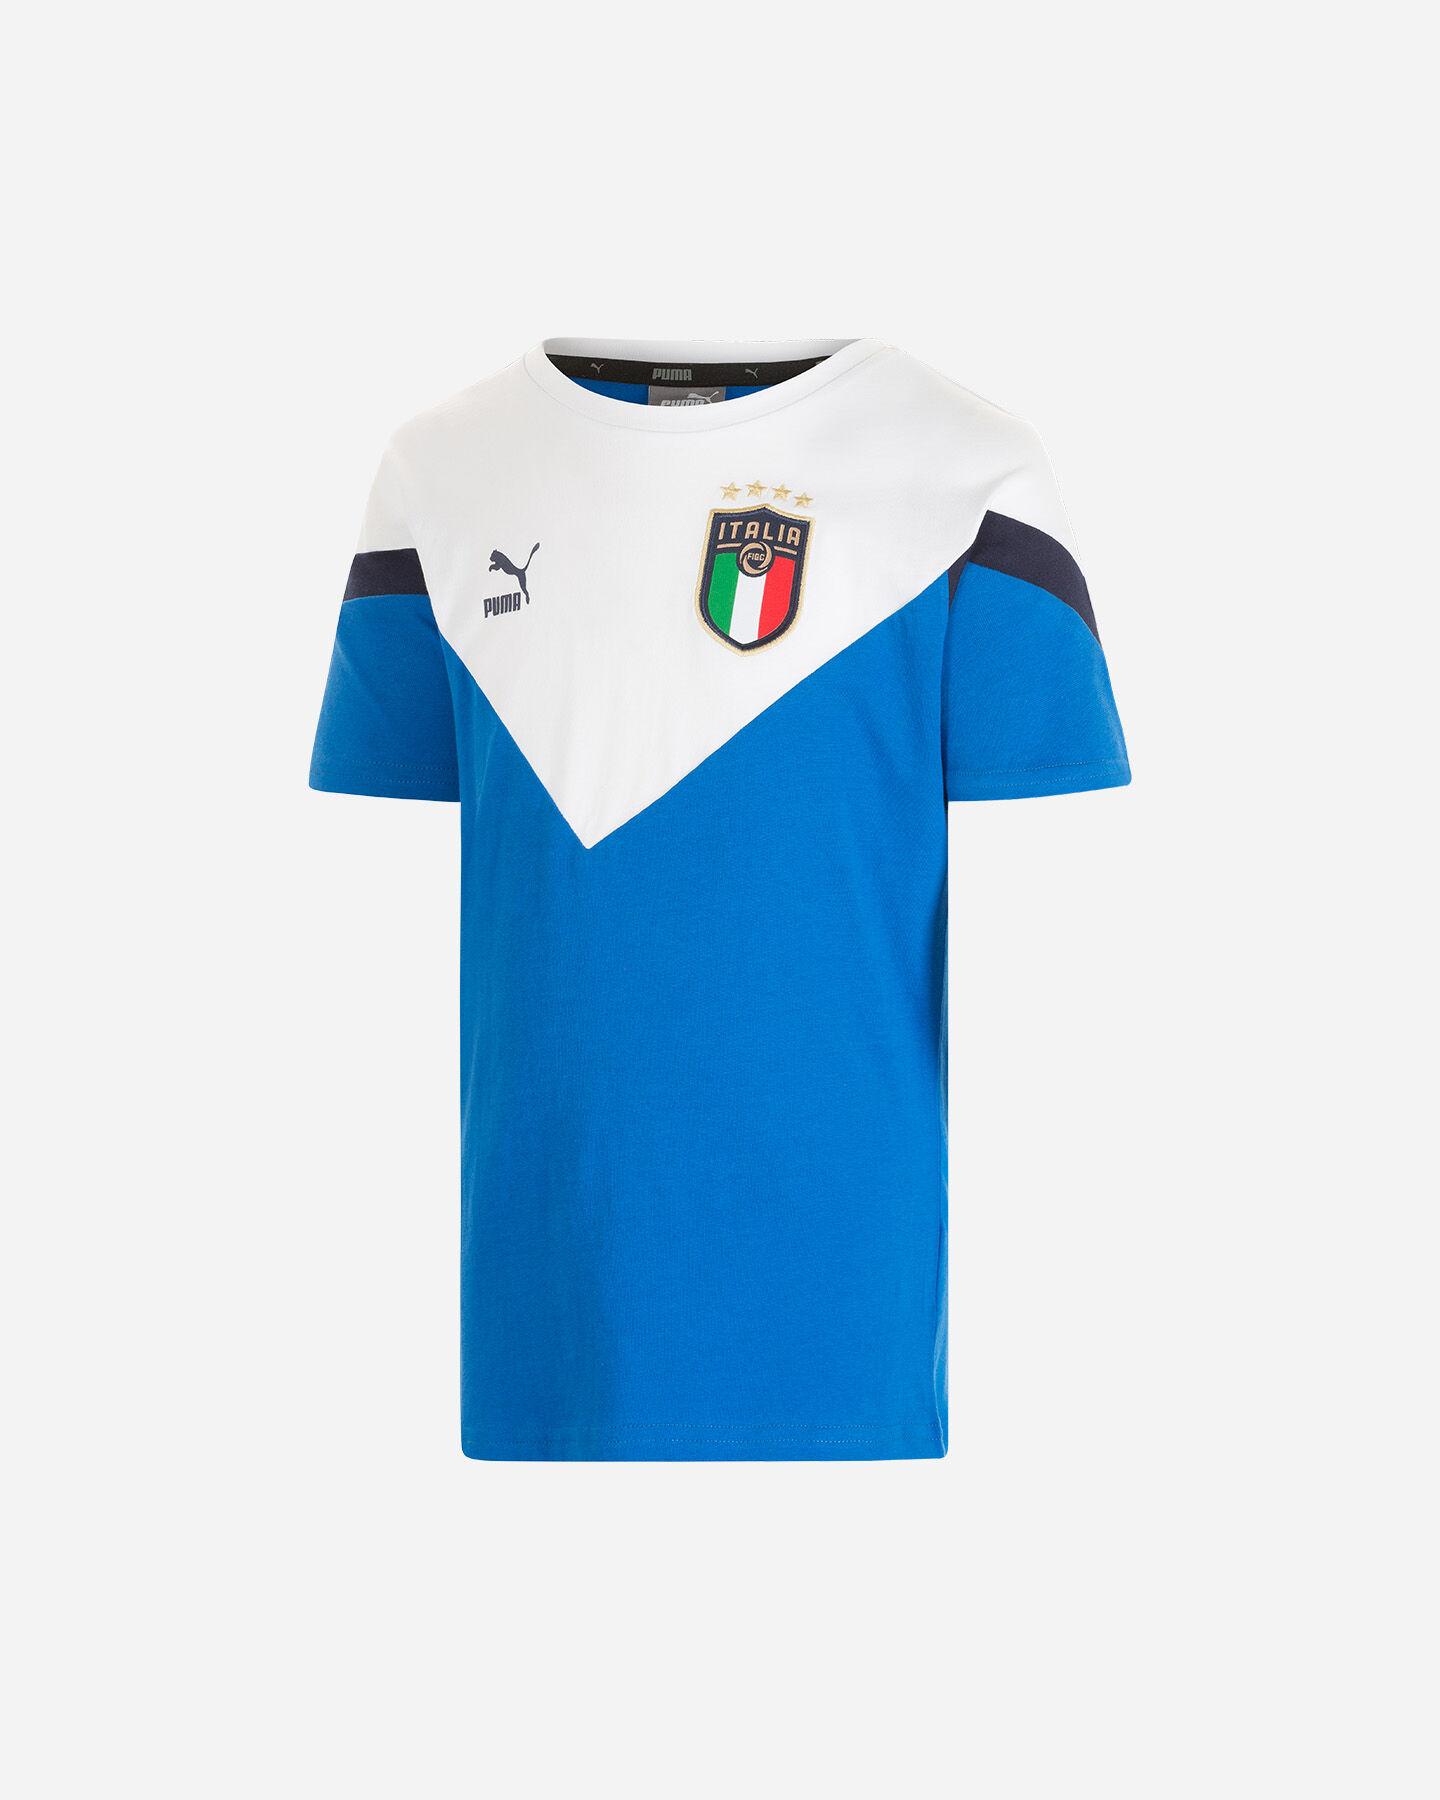 Merchandising calcio ufficiale da bambino - Cisalfa Sport